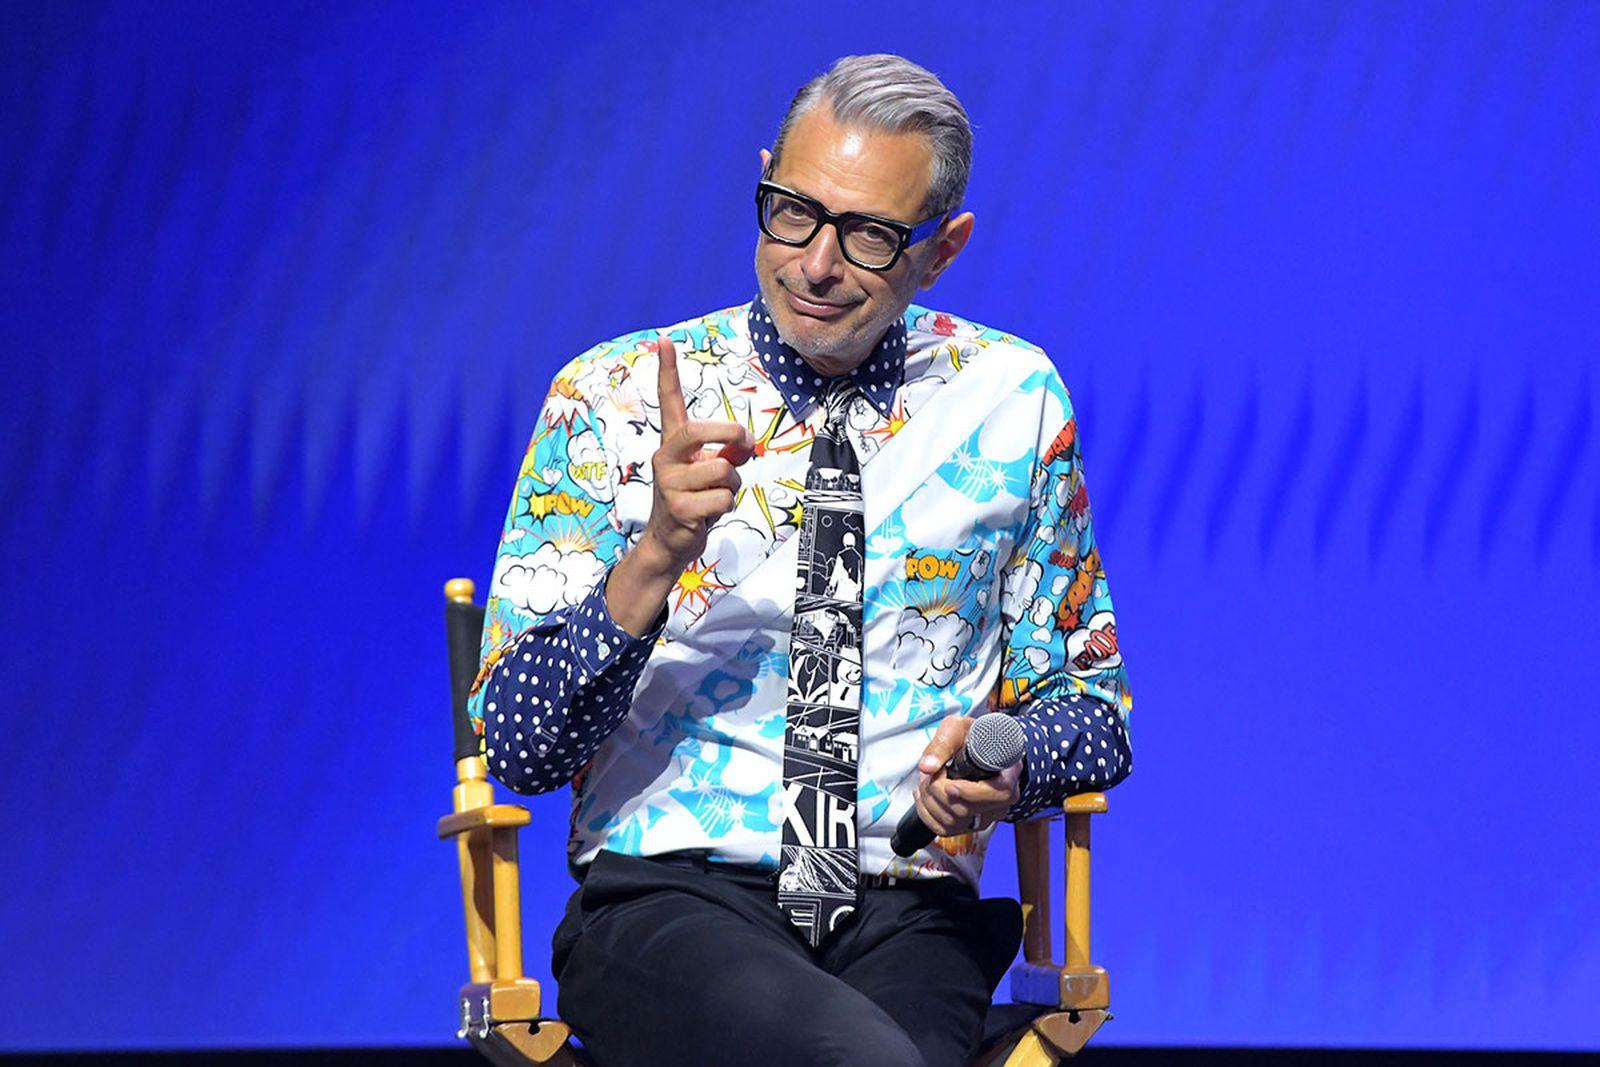 Jeff Goldblum on stage microphone